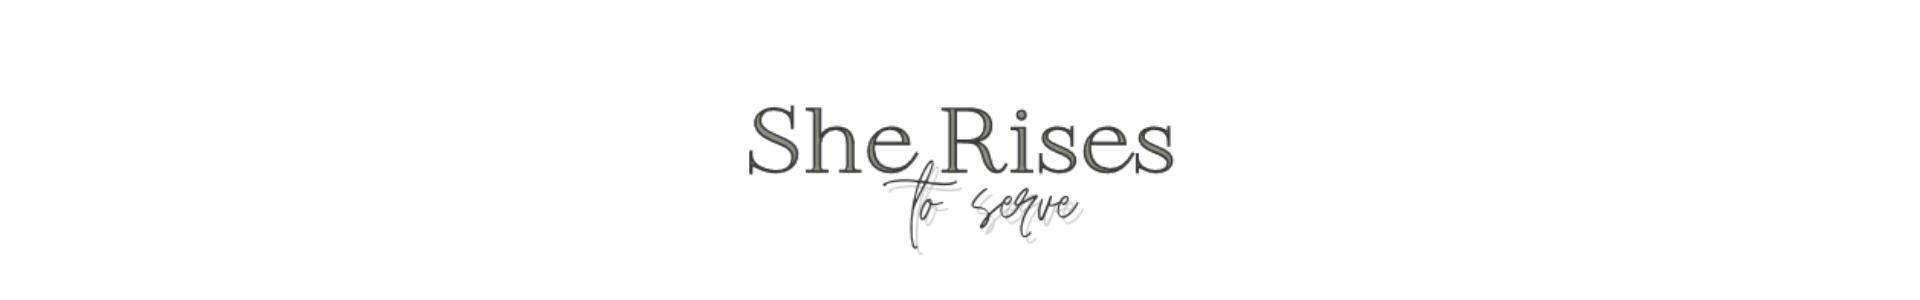 She-rises.net